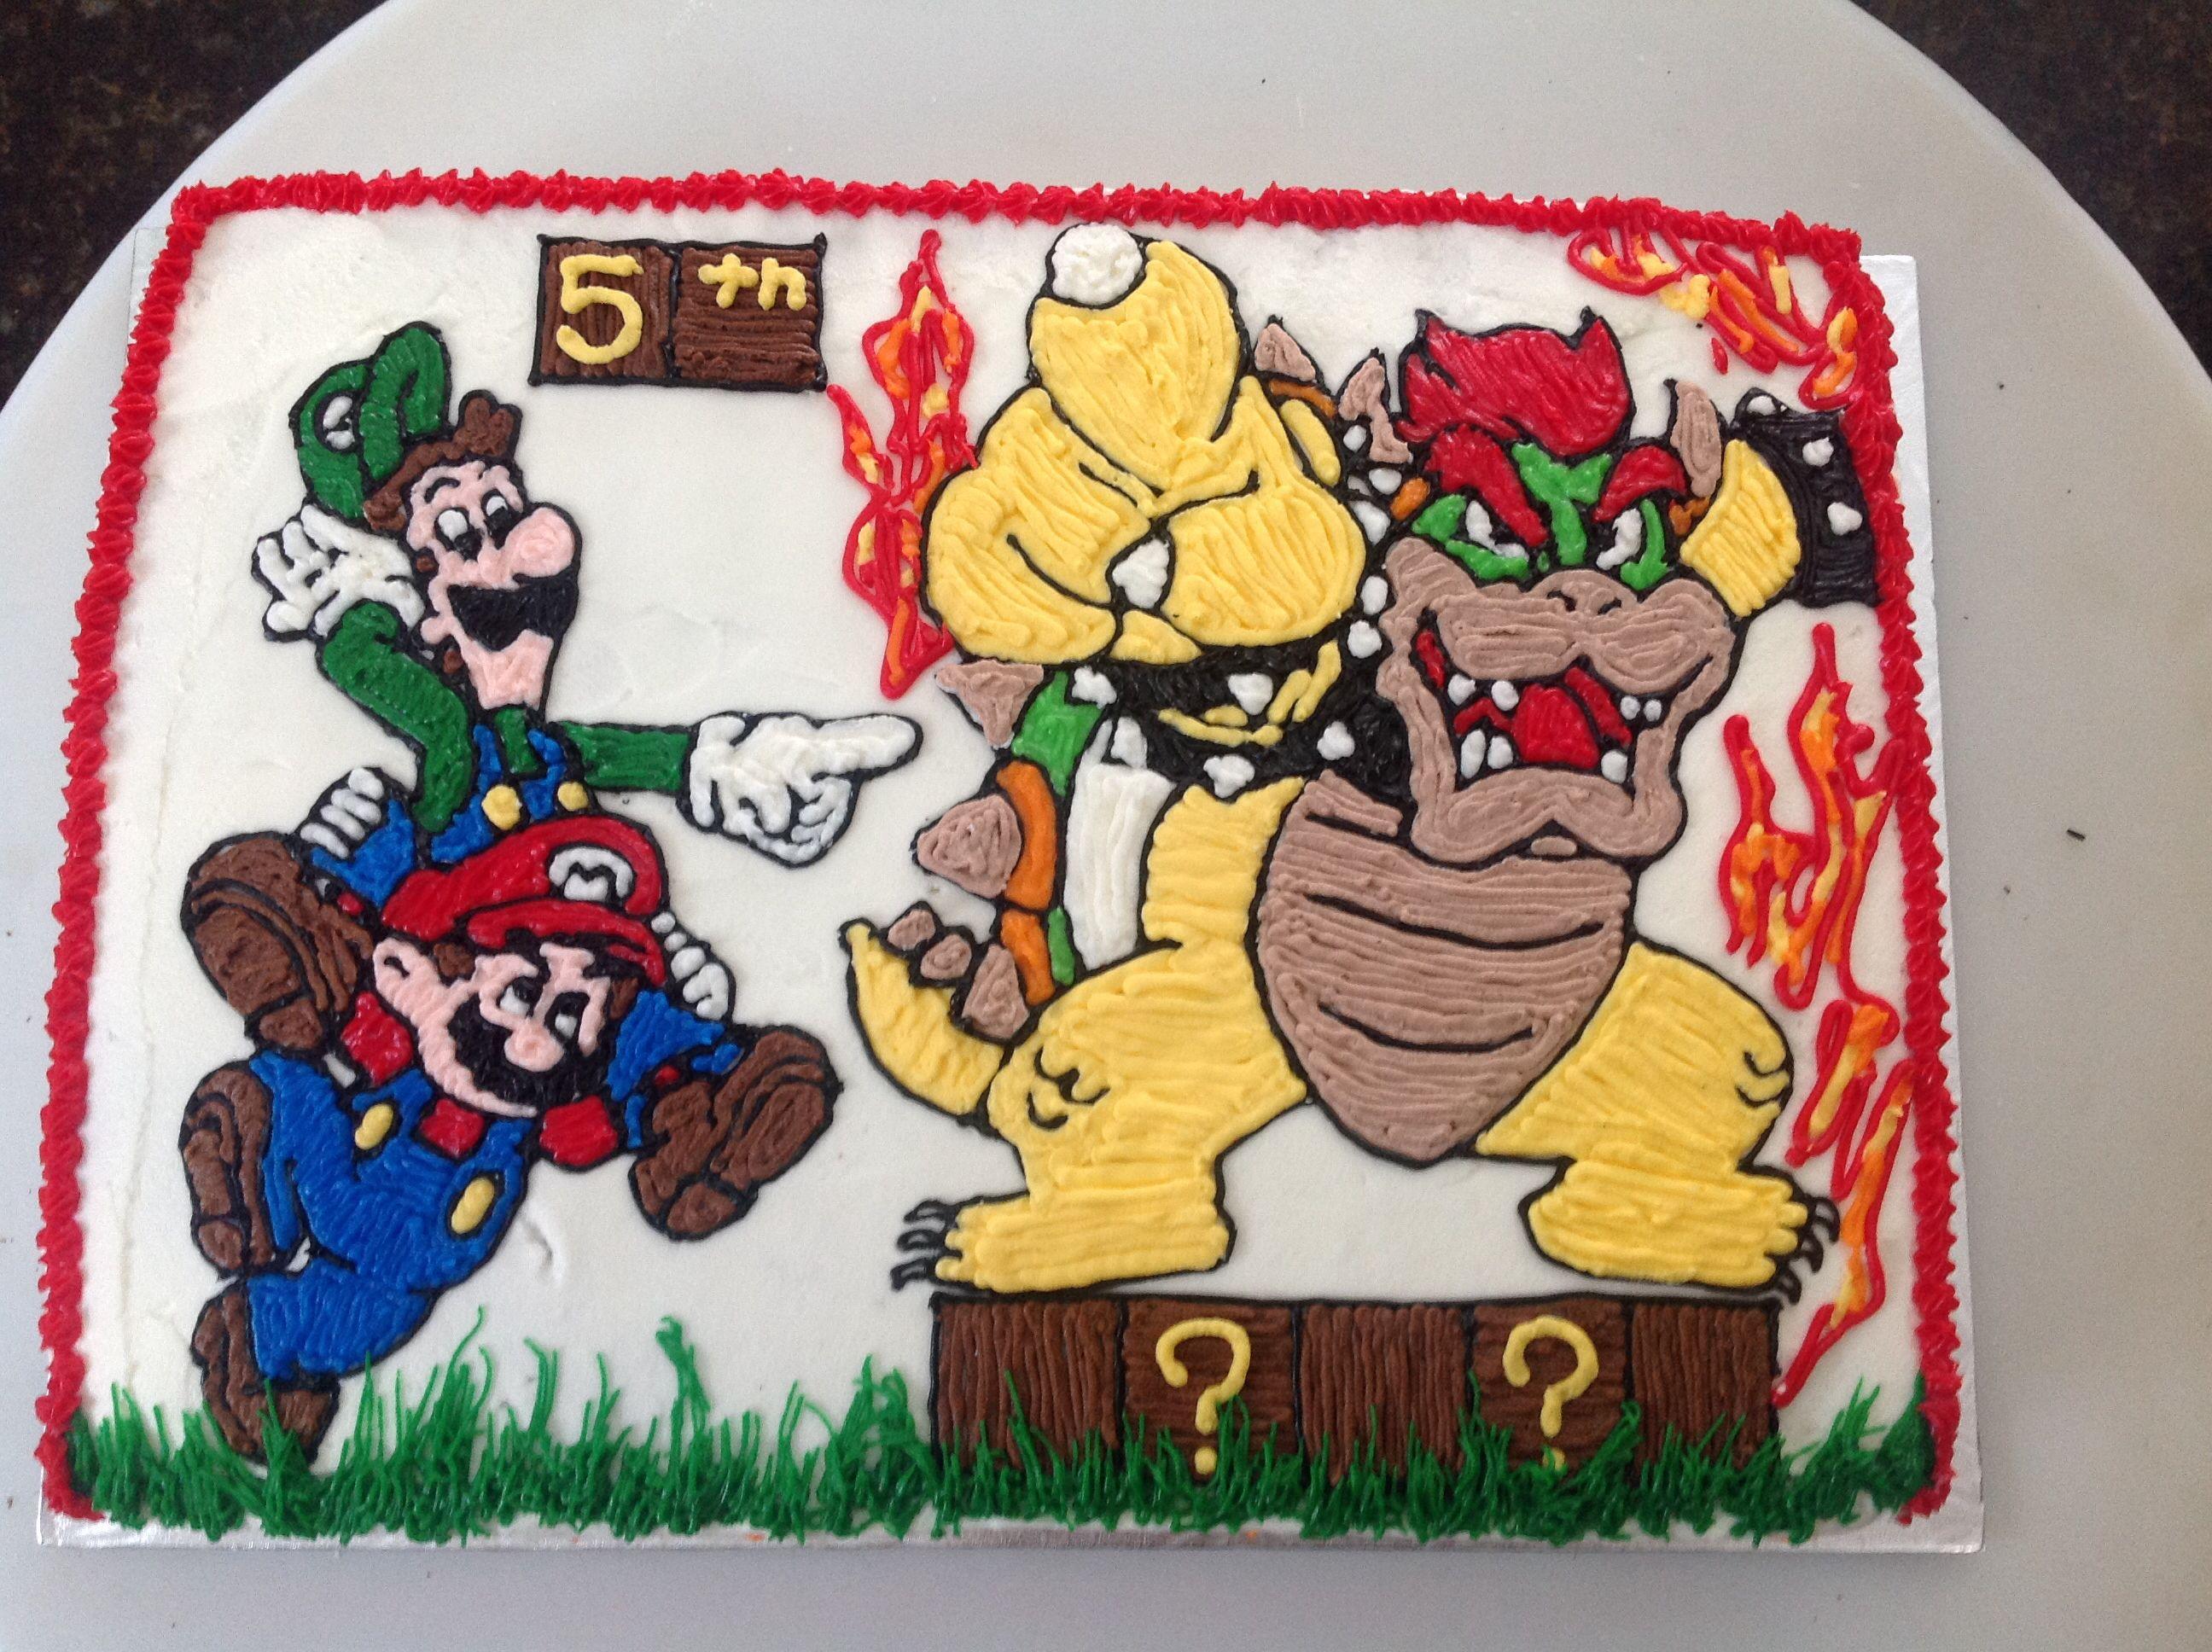 Mario Luigi And Bowser Cake